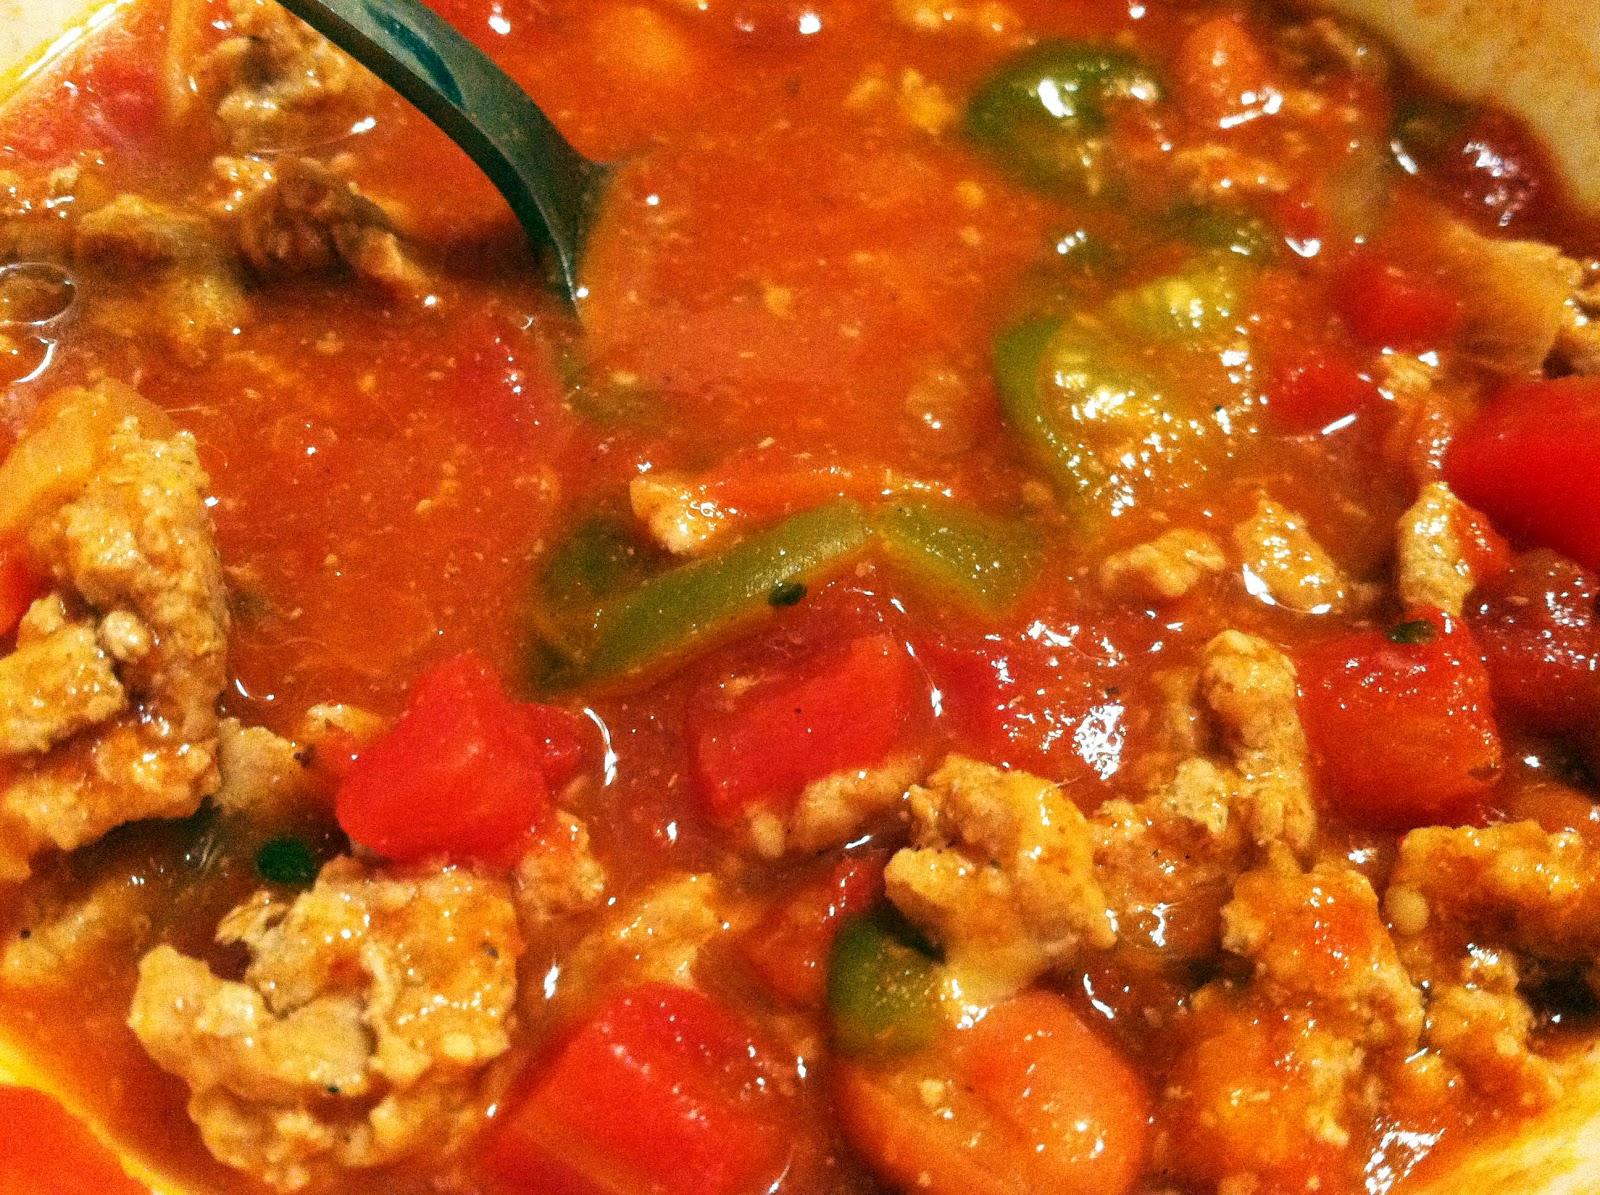 ButchInTheKitchen: Low Calorie Crock Pot Turkey Chili With Tomatillos